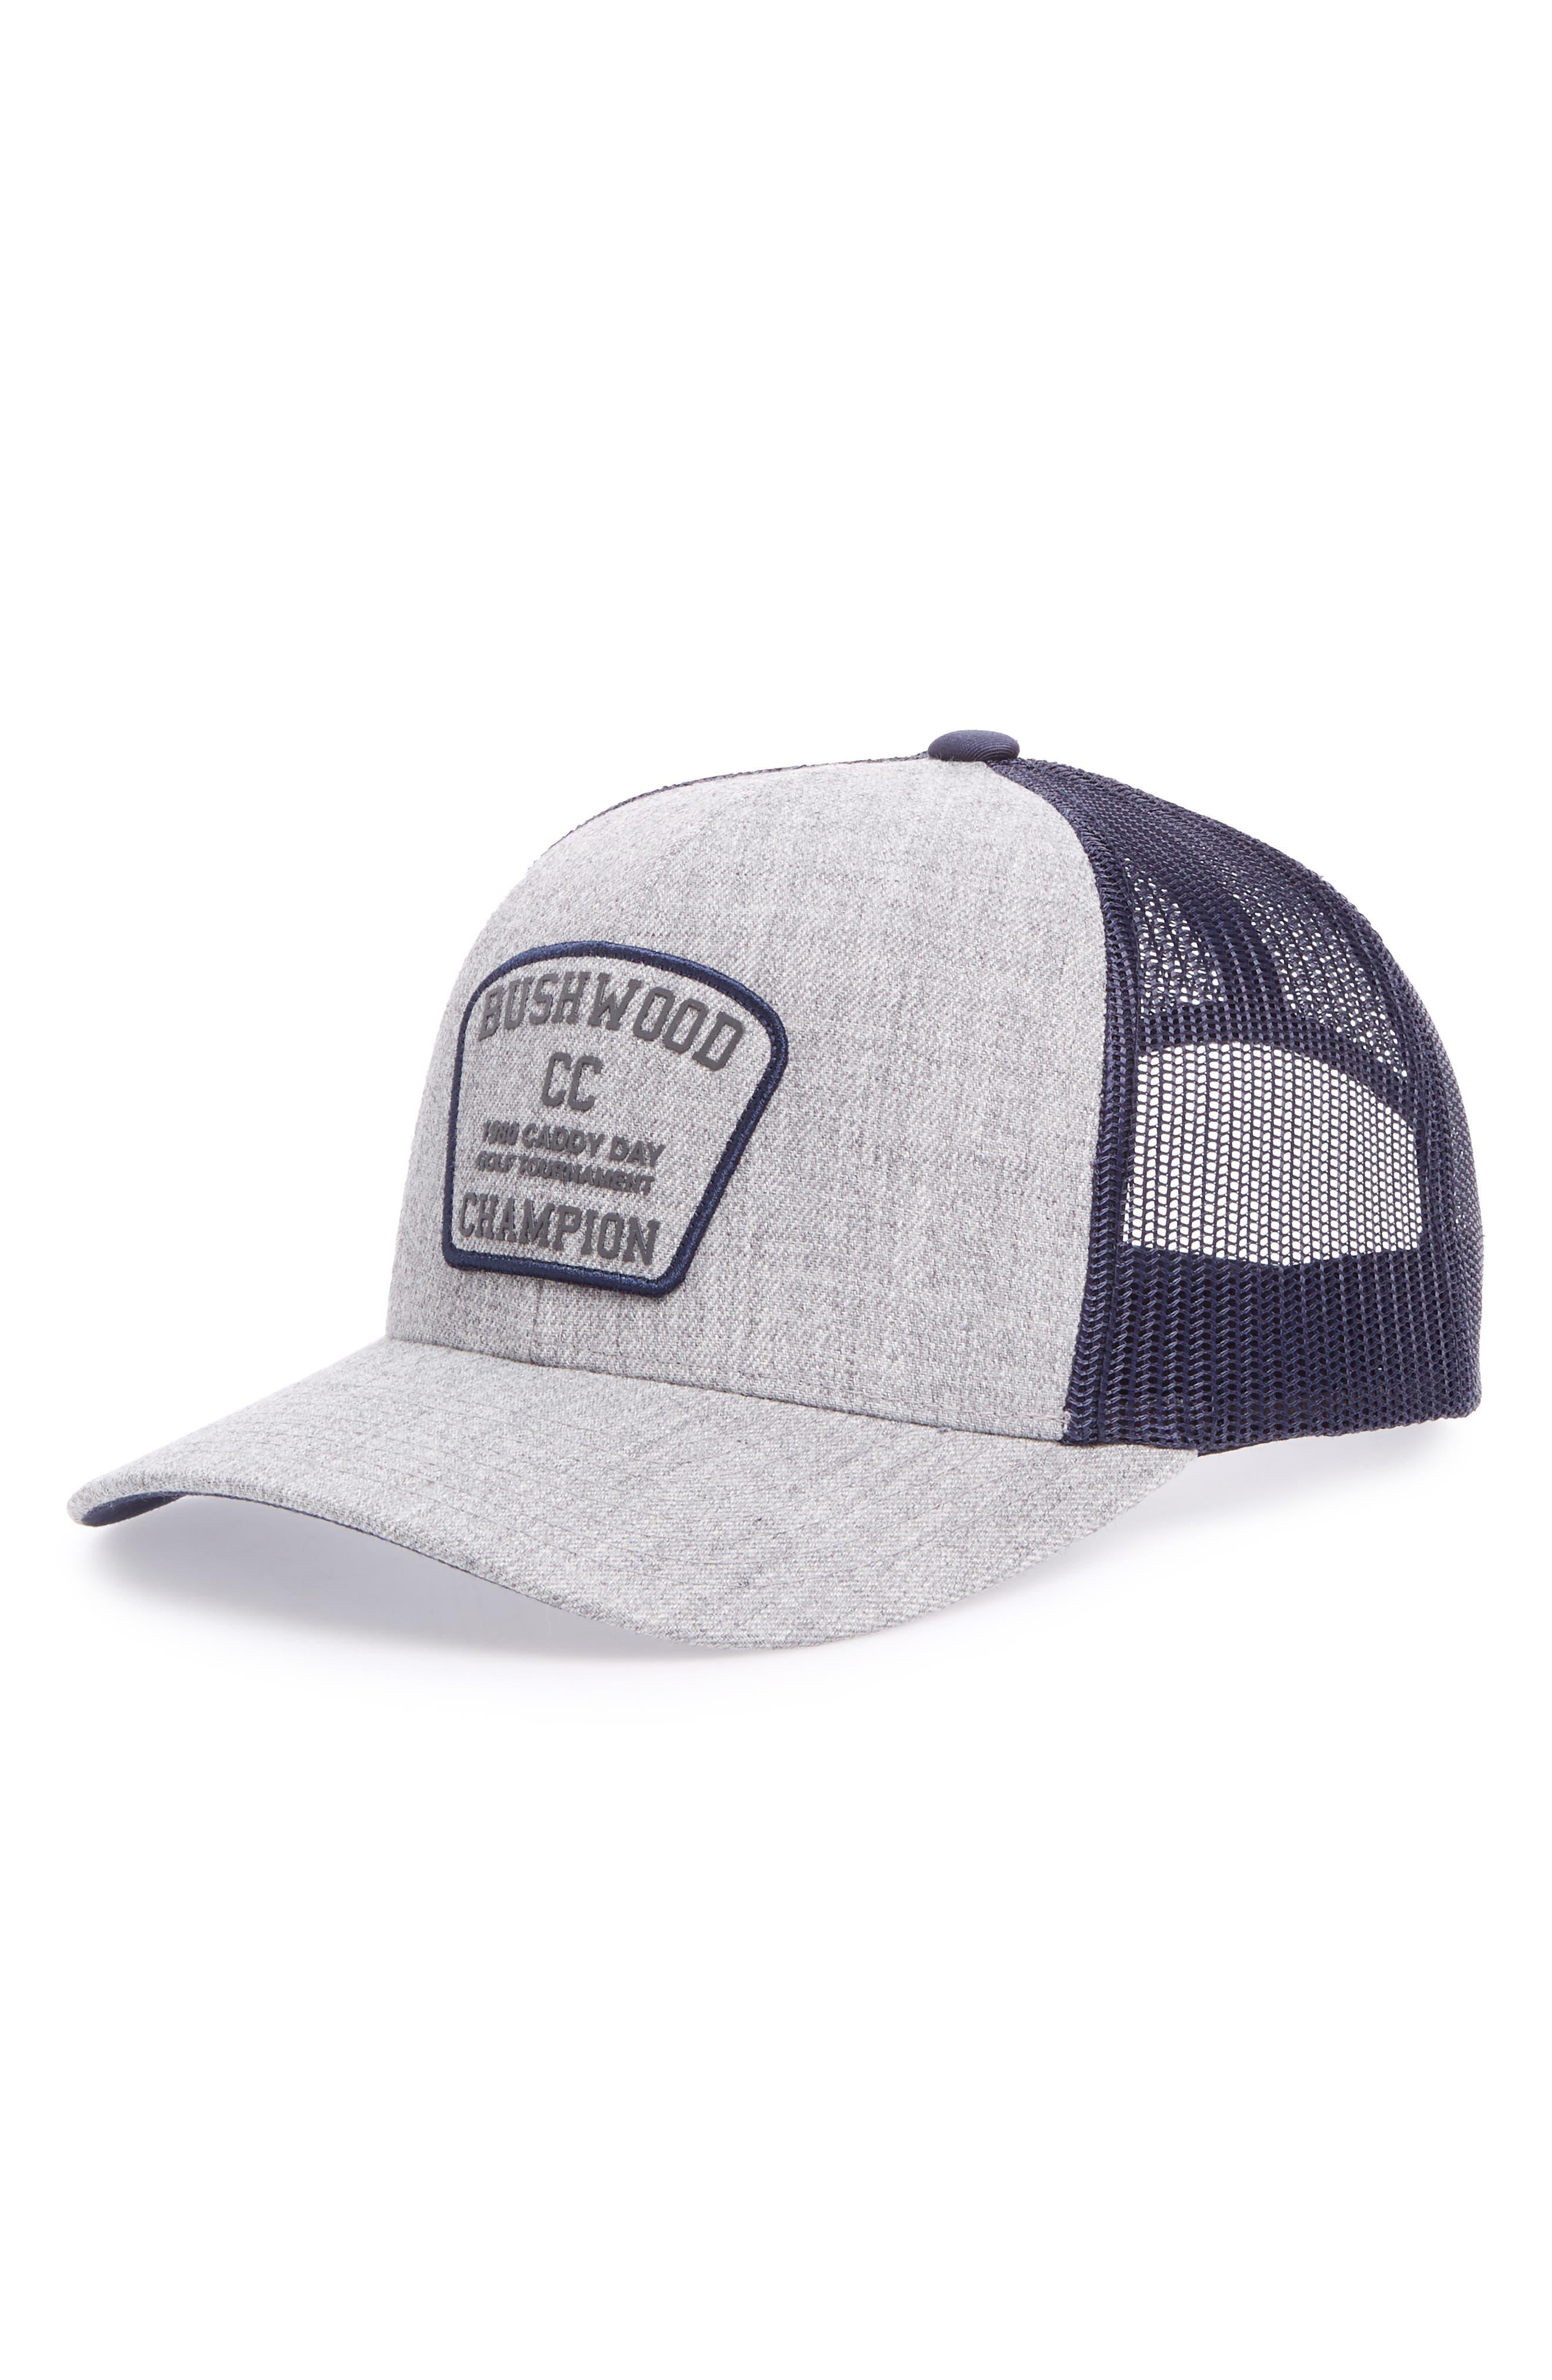 Cinderella Story Trucker Hat,                         Main,                         color, 021